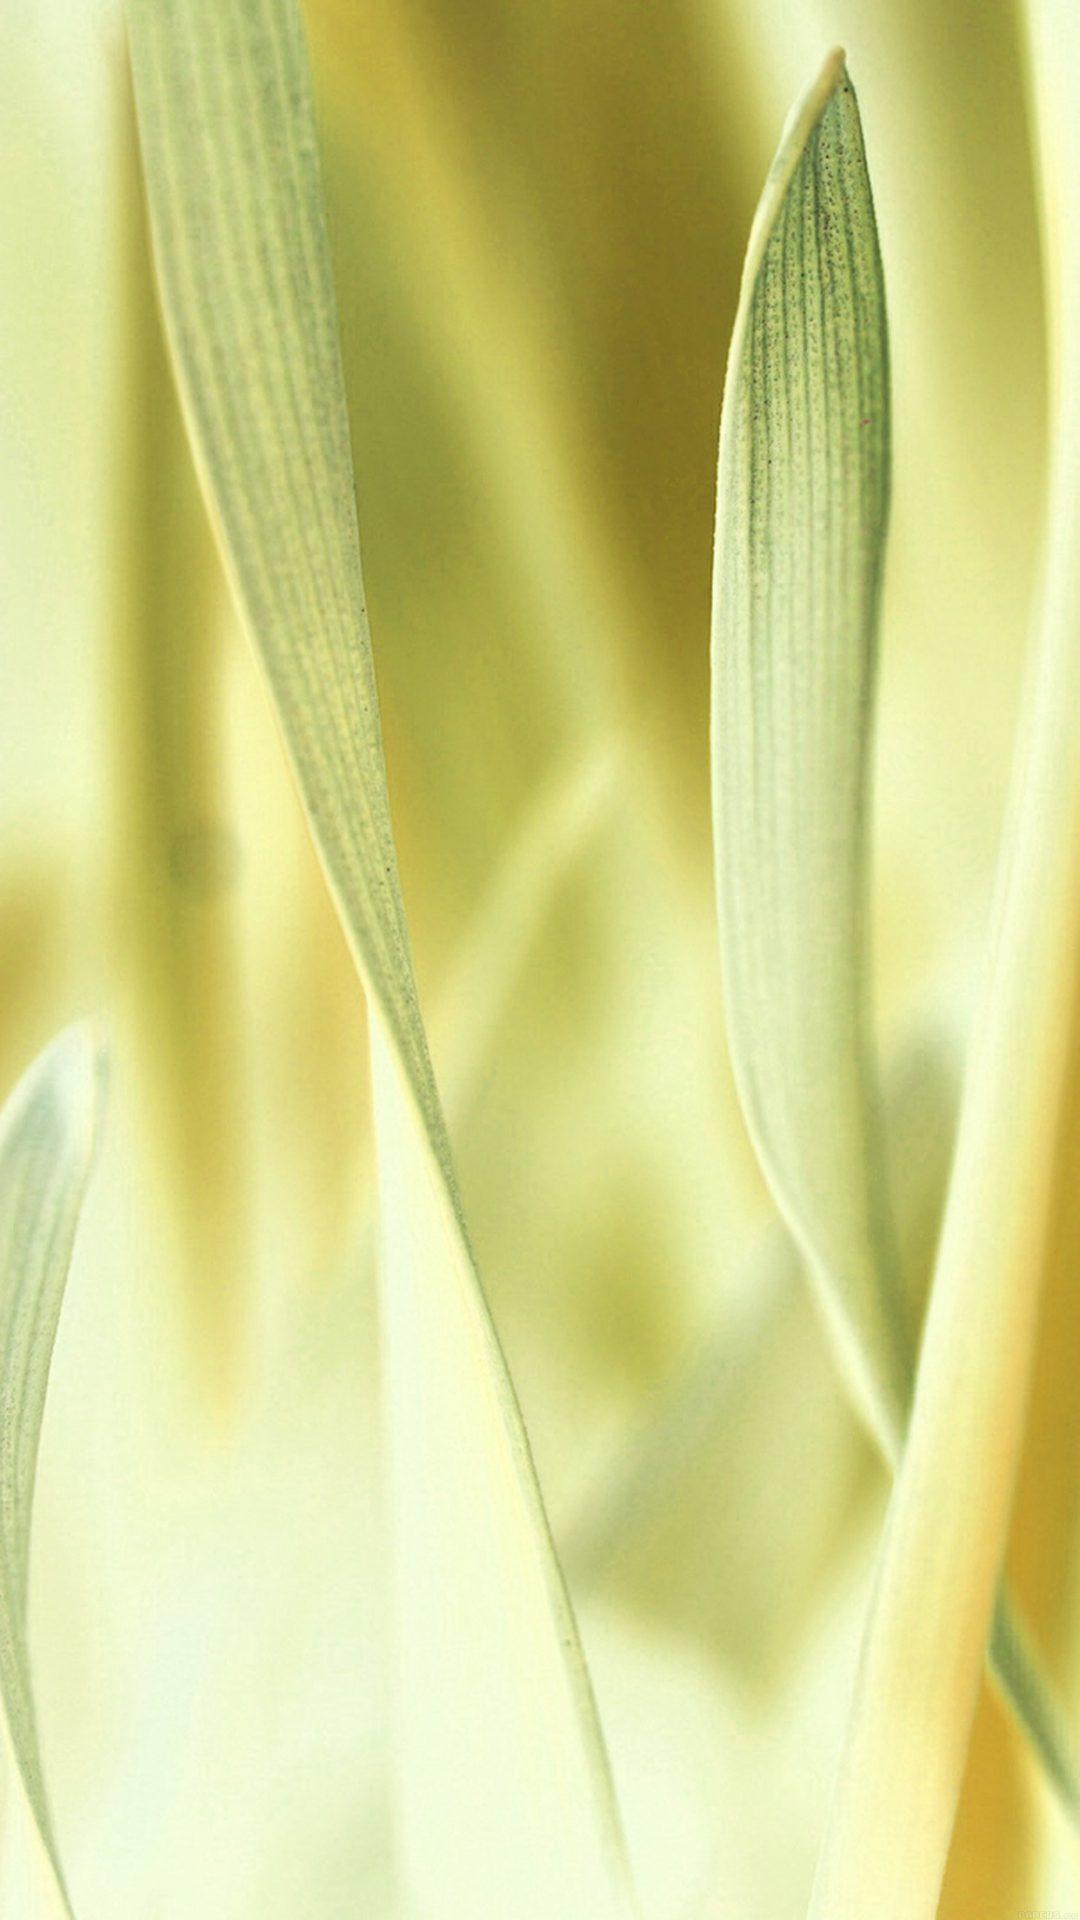 Leaf Grass White Bokeh Nature